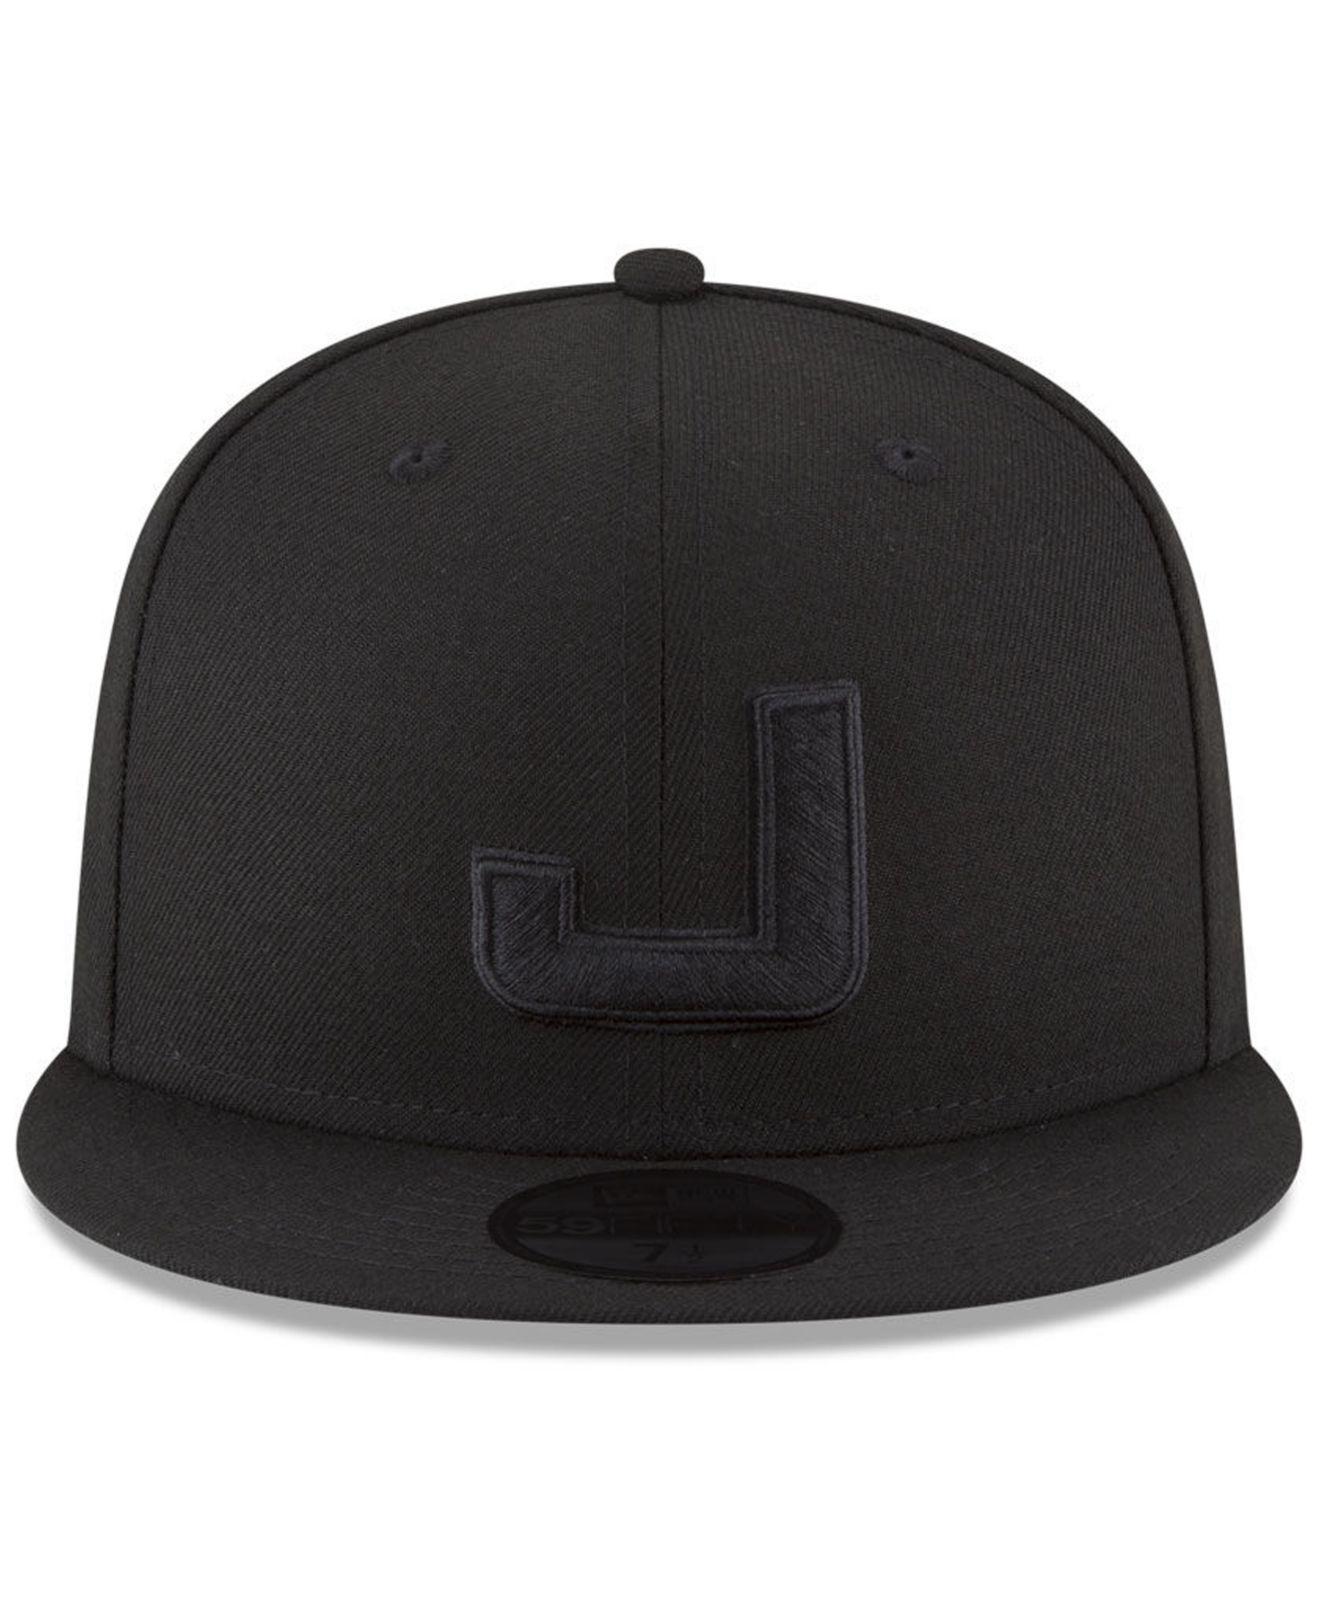 huge discount ad609 3be9d KTZ Utah Jazz Alpha Triple Black 59fifty Fitted Cap in Black for Men ...